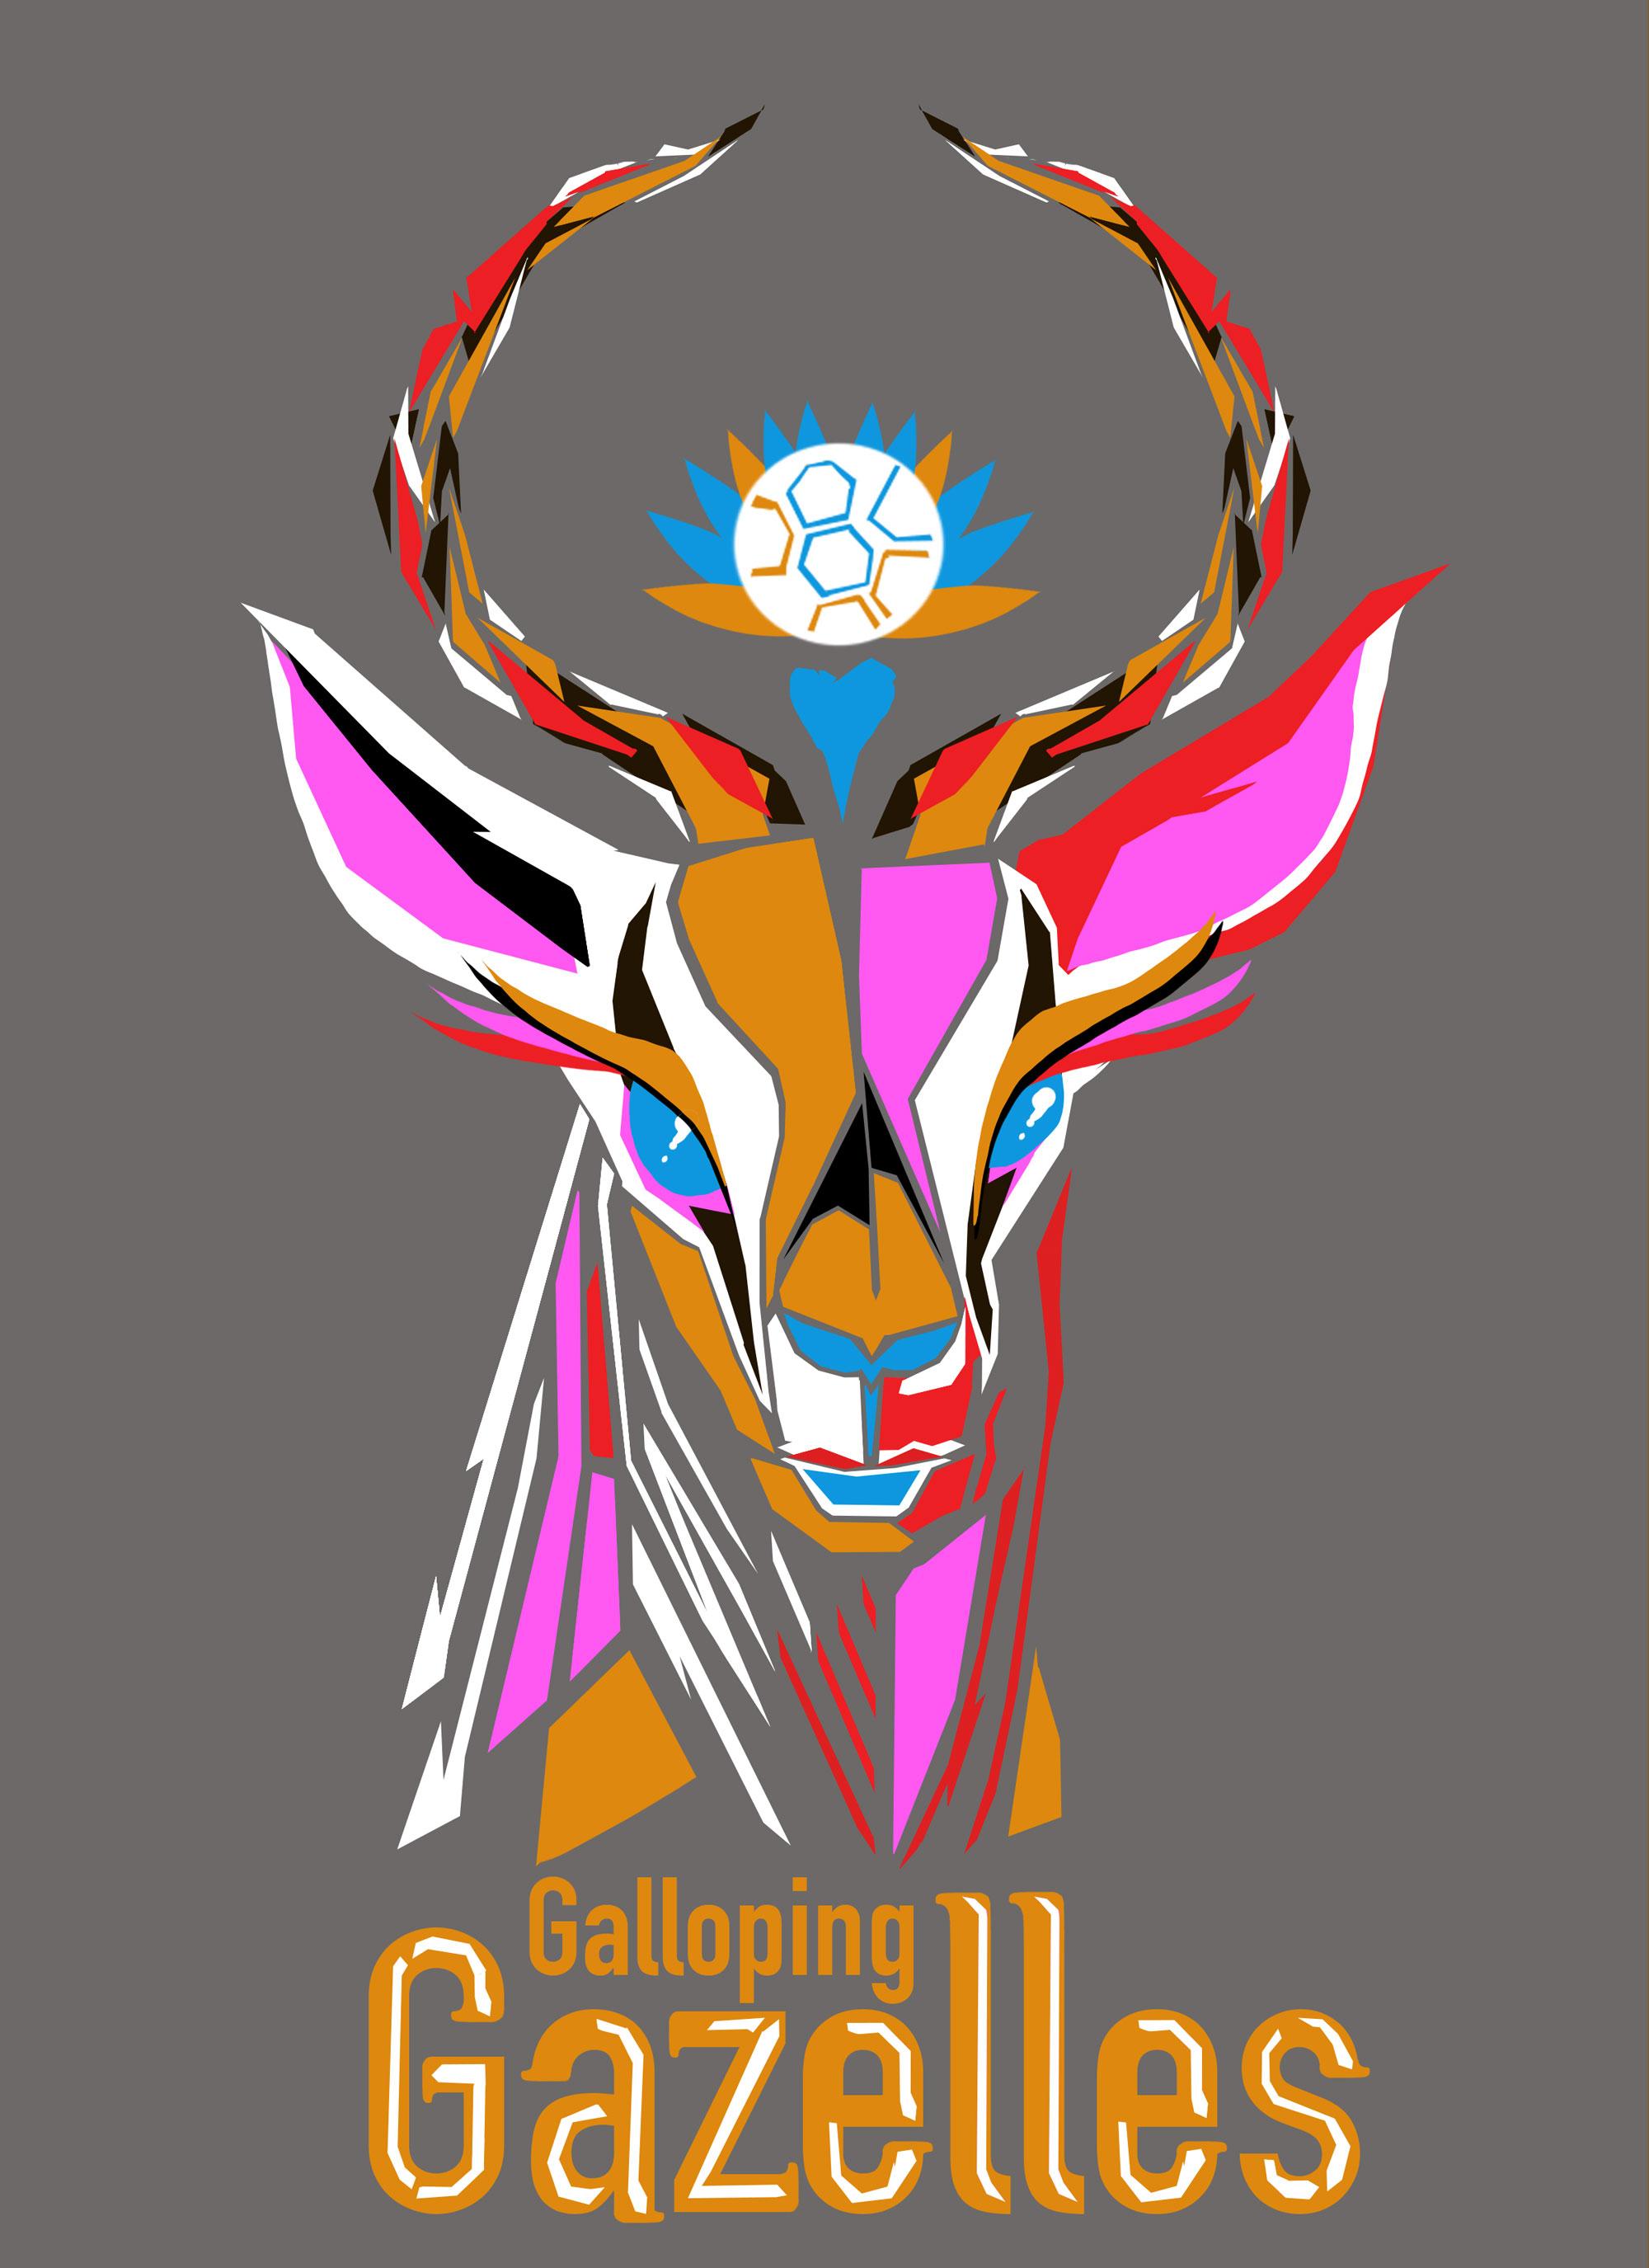 galloping_gazelles_A01.jpg